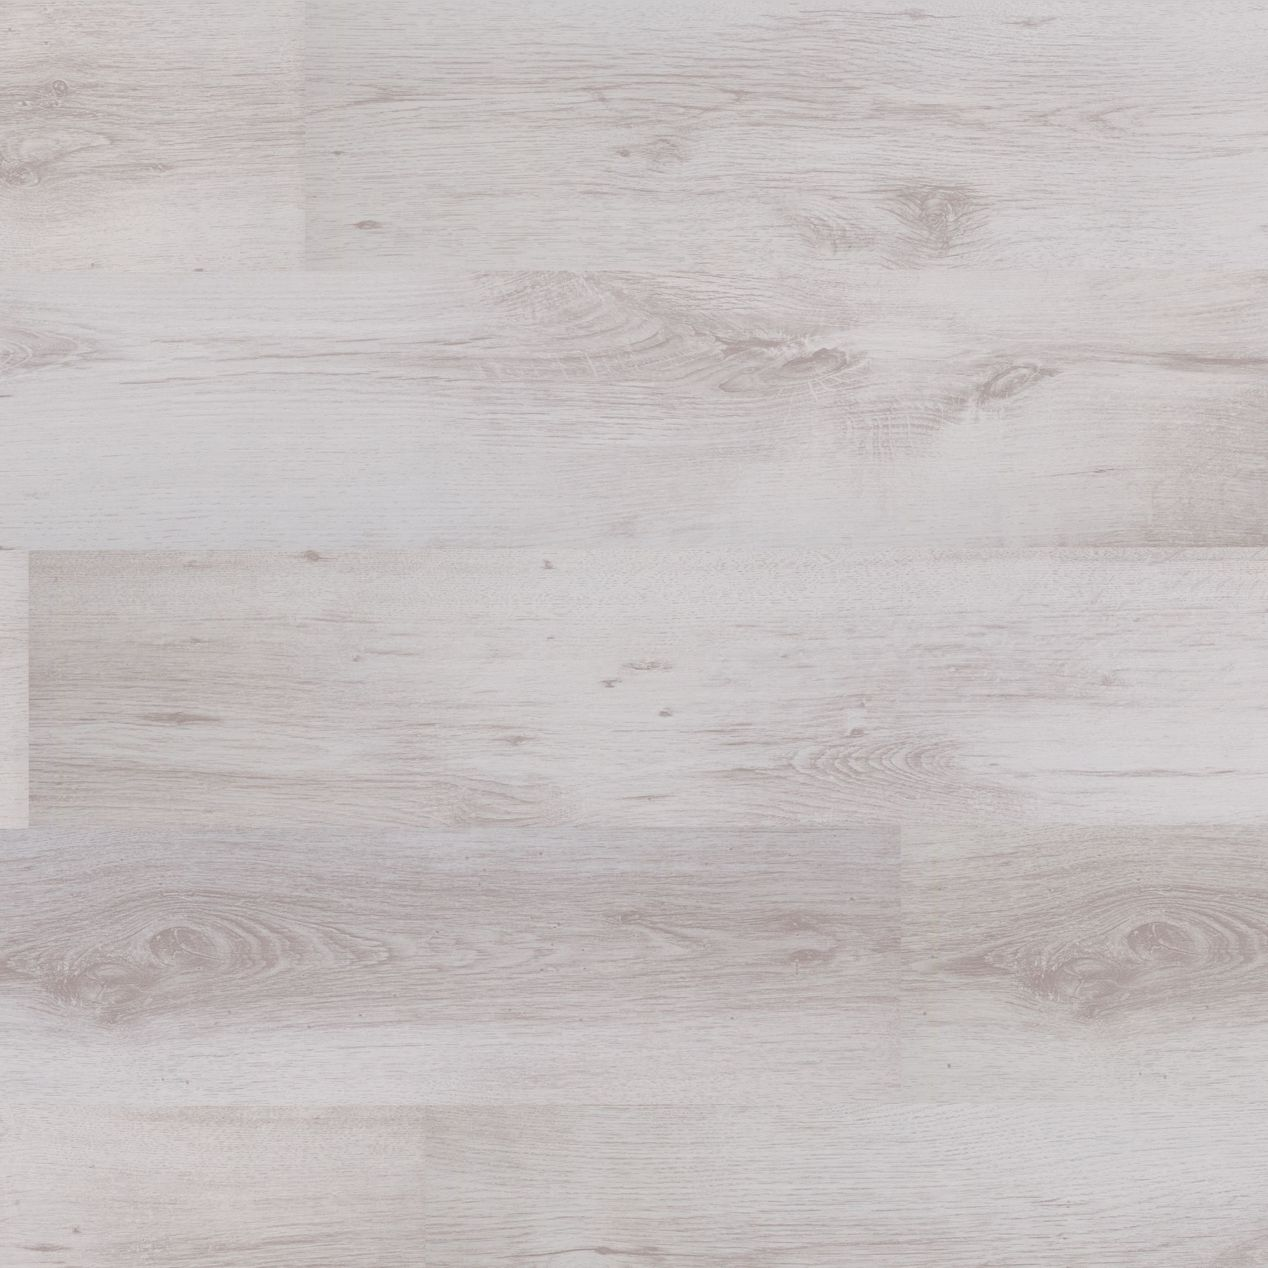 hori klick laminat selection eiche rustic wei optional. Black Bedroom Furniture Sets. Home Design Ideas